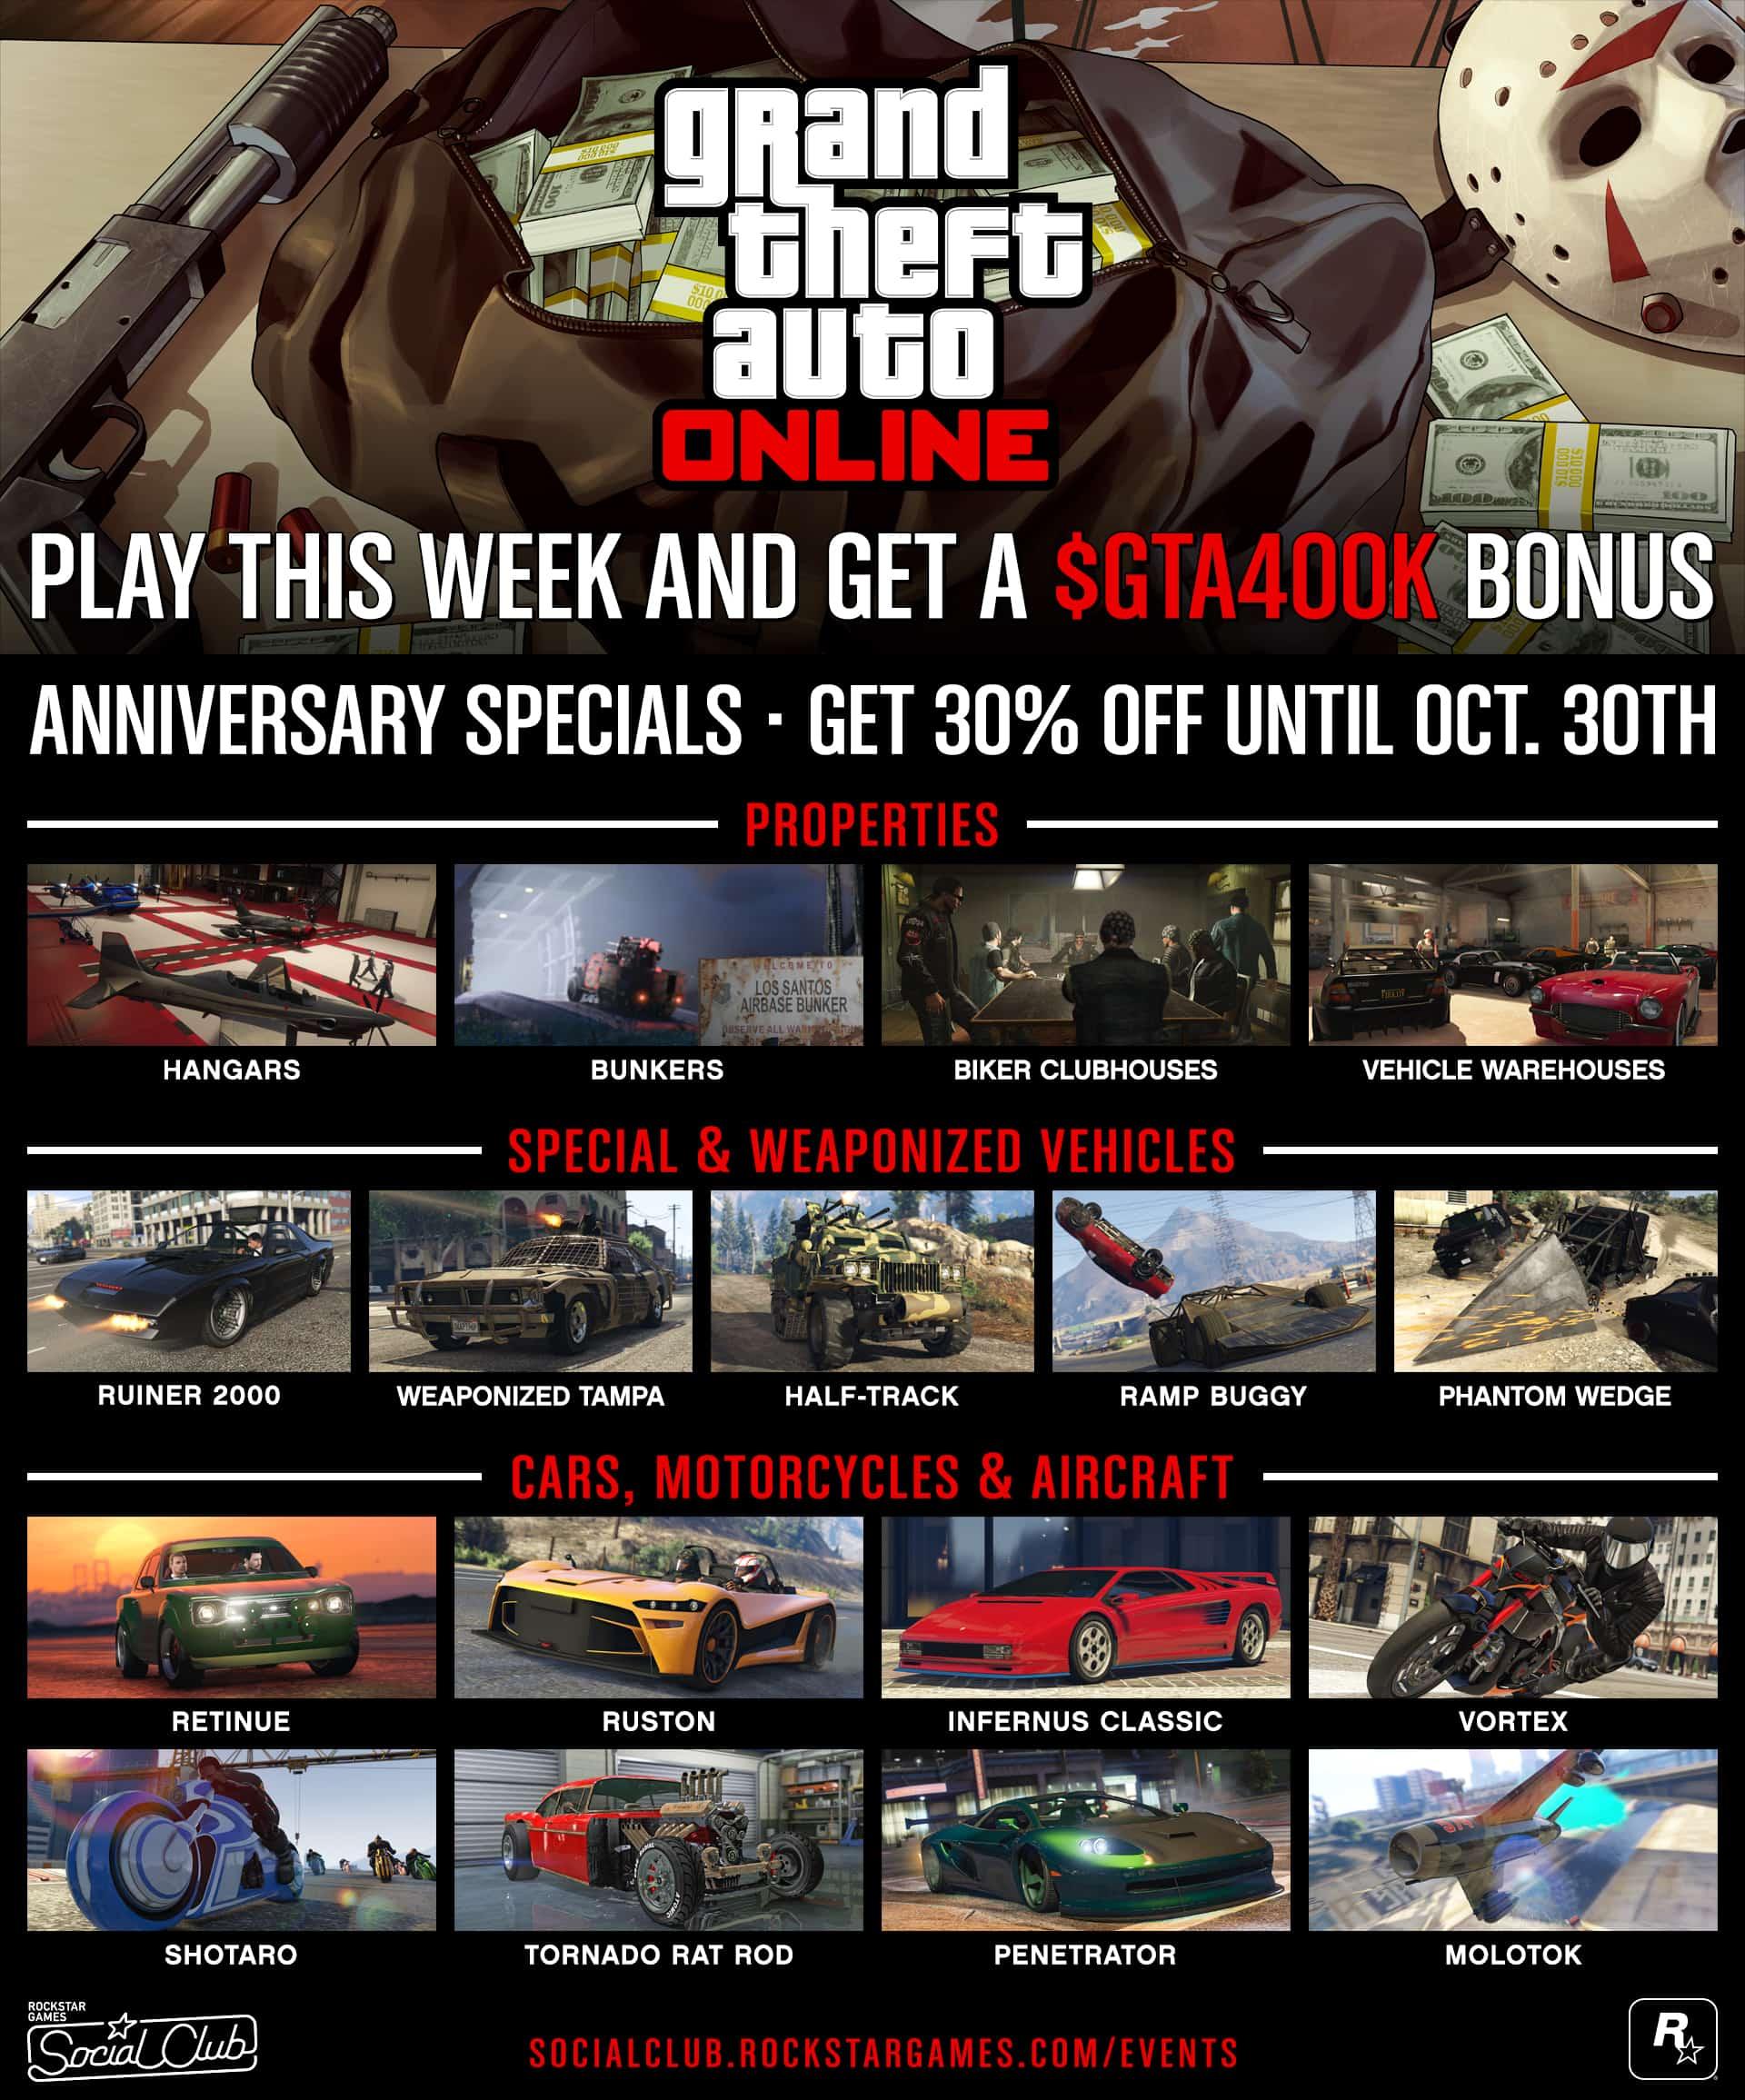 GTA Online: New Car, Free Cash, Halloween, Oh Boy - GTA BOOM